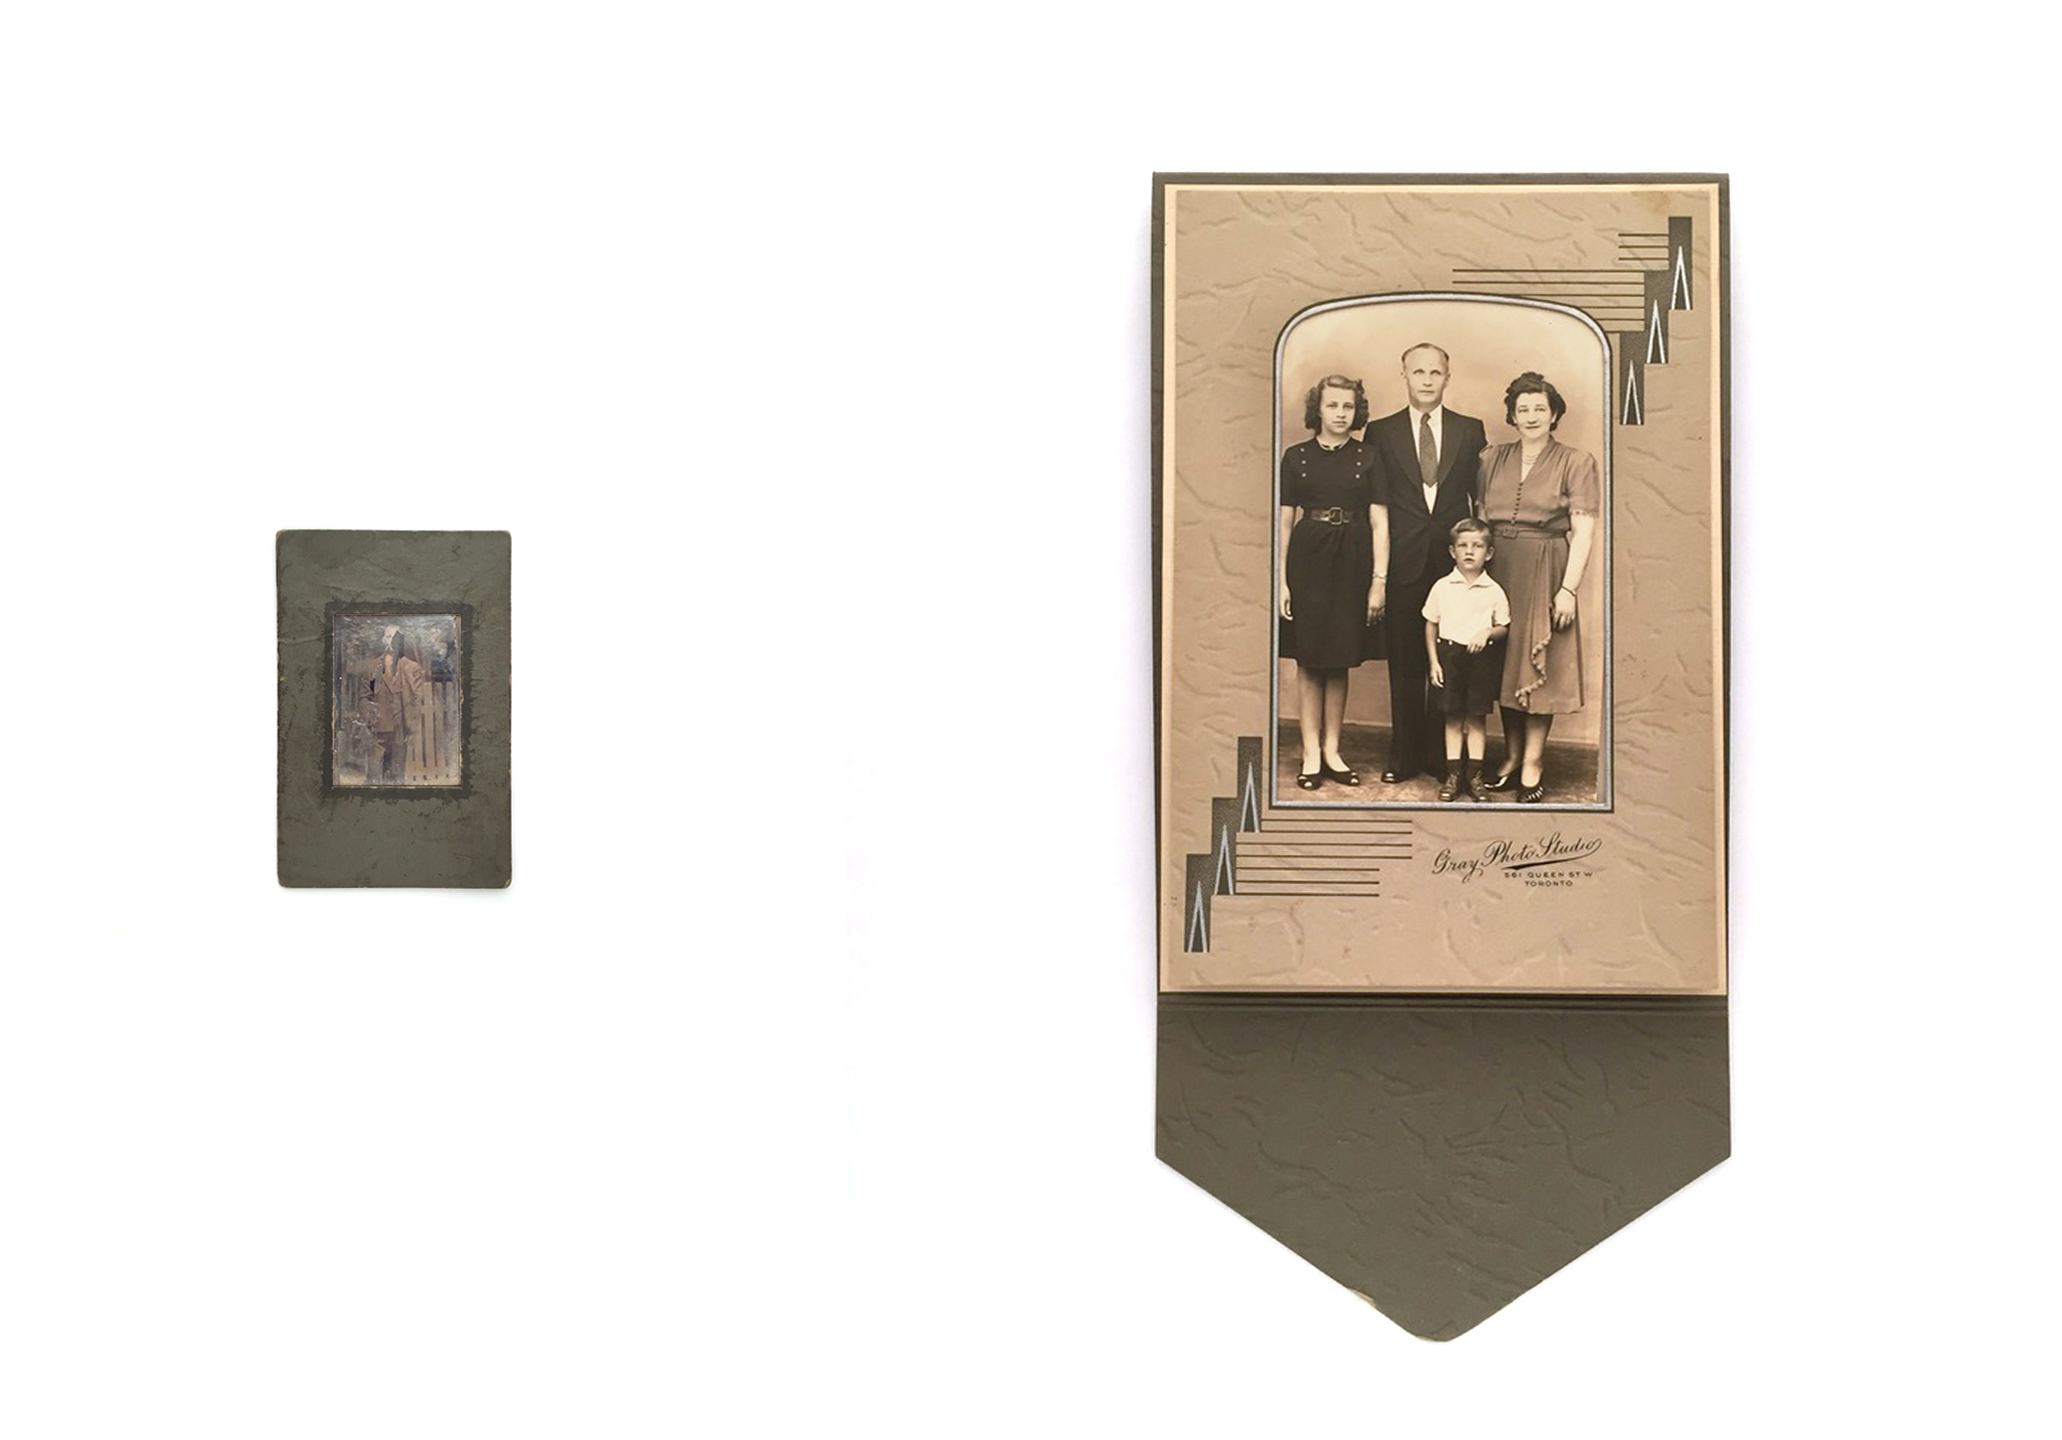 Fig. 1: Portraits of My Paternal Grandfather & Family, Machinski (2018)